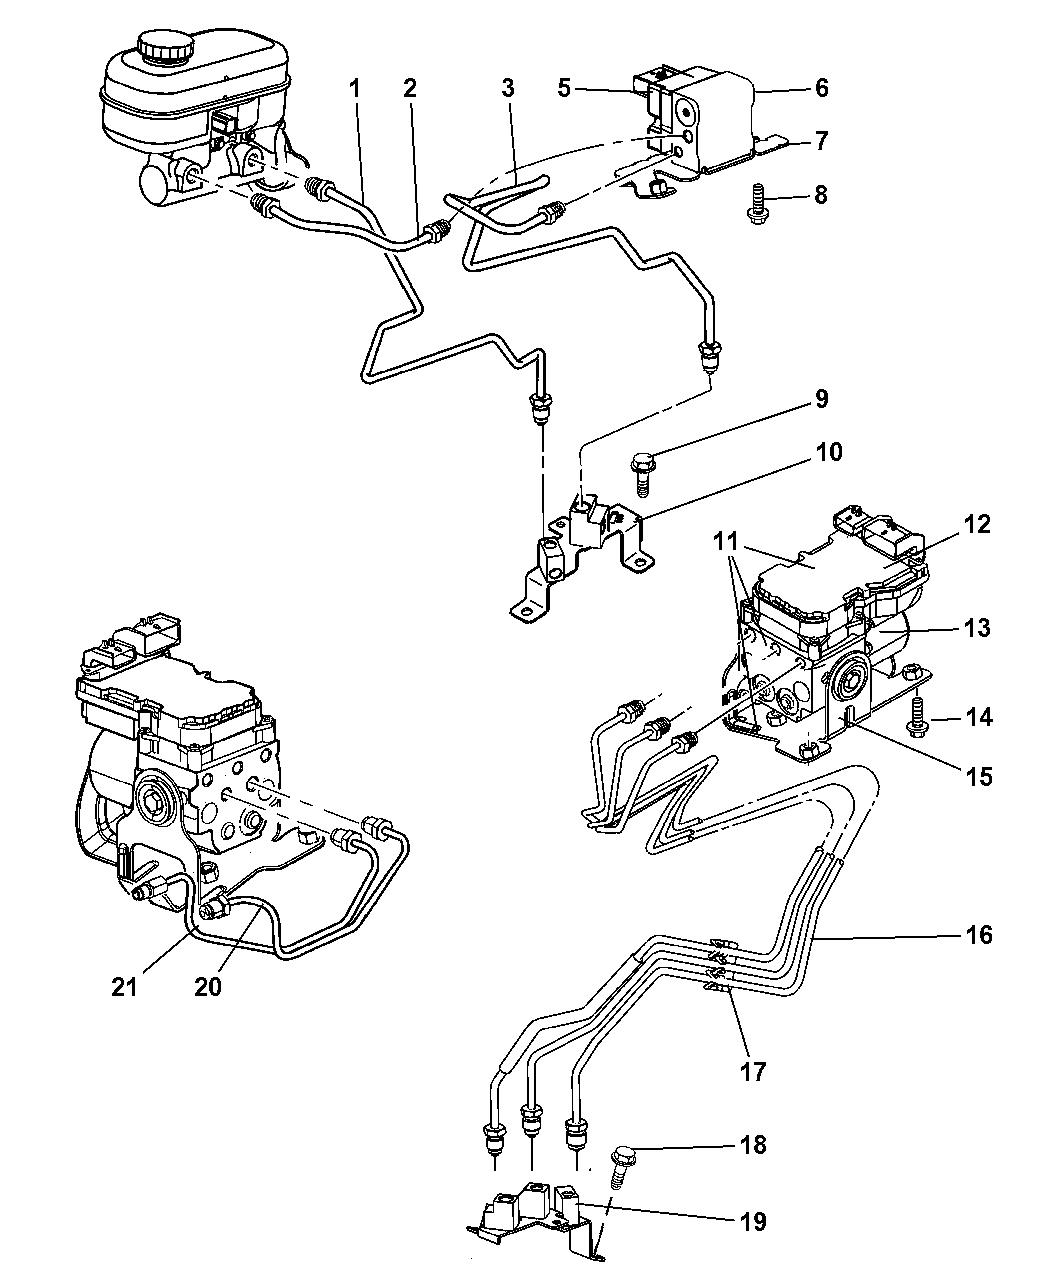 Brake Lining Diagram : Ab genuine dodge line brake